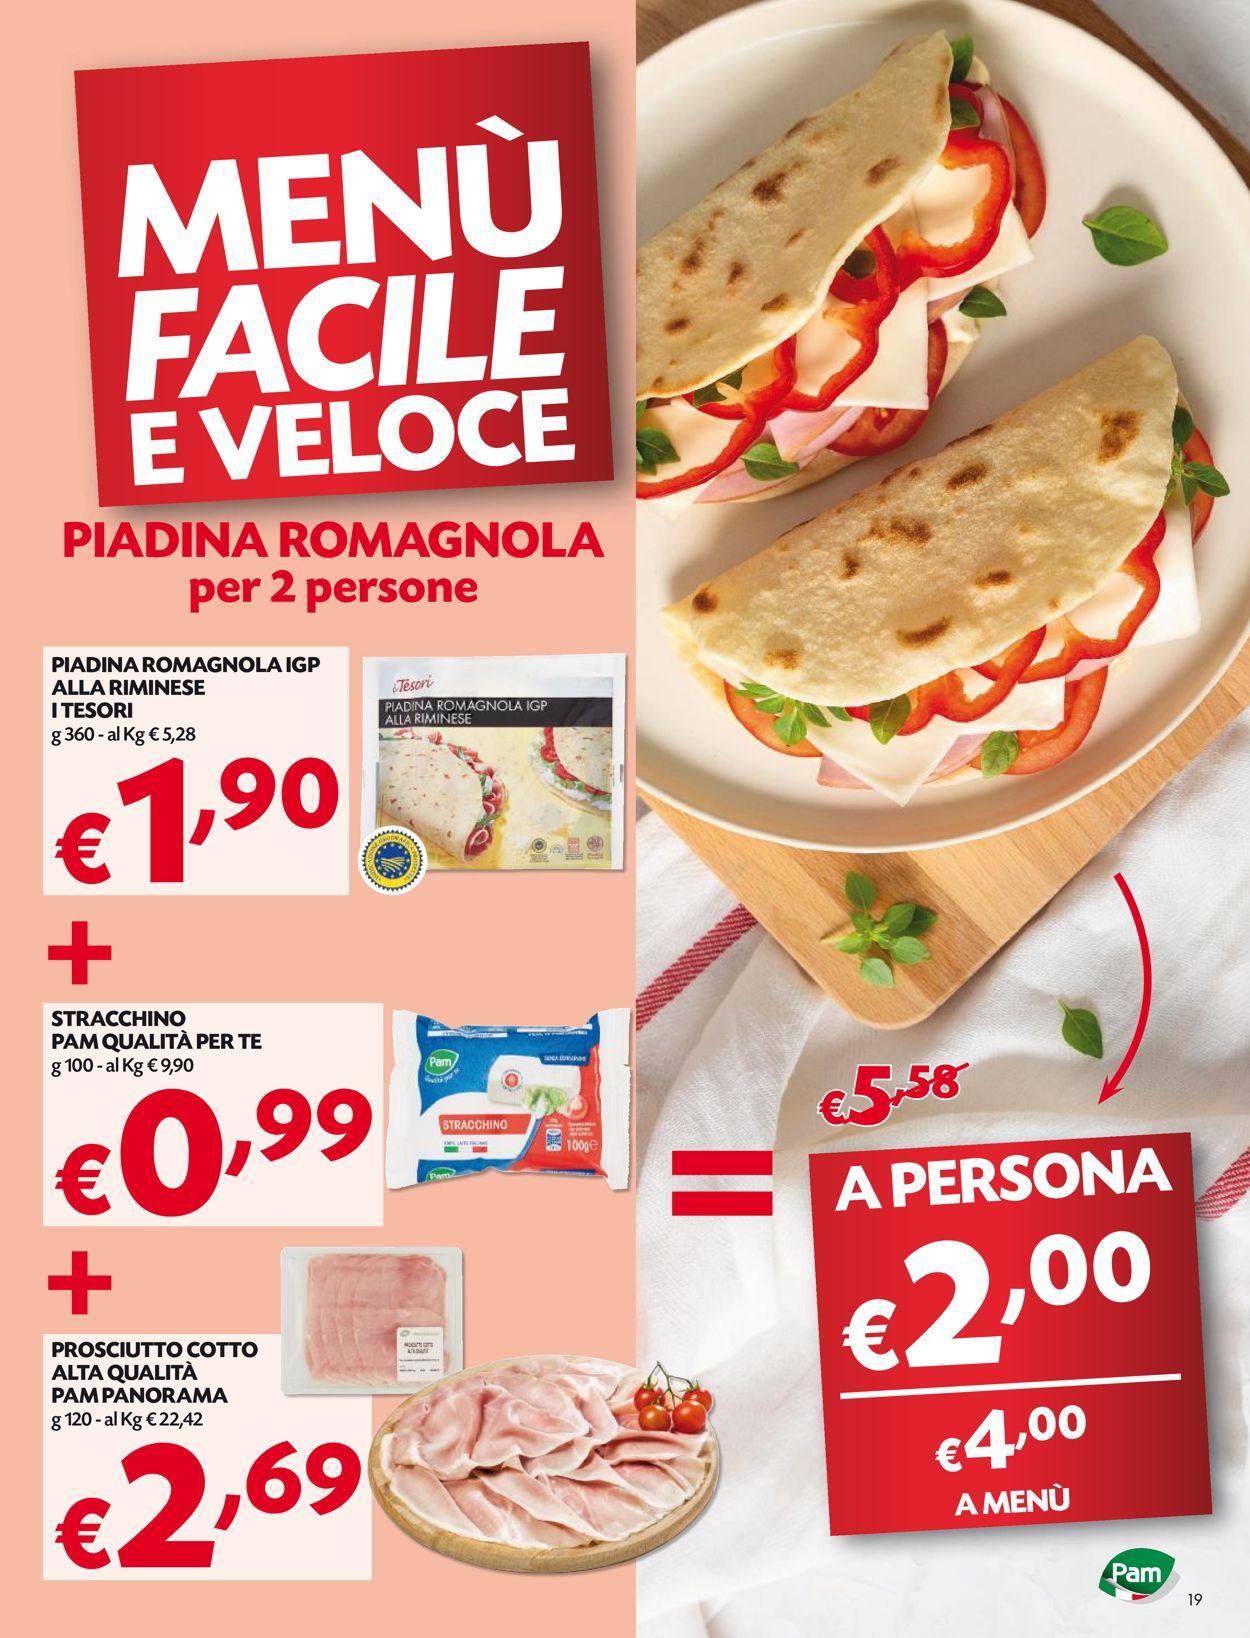 Volantino Pam Panorama - Offerte 06/04-21/04/2021 (Pagina 19)